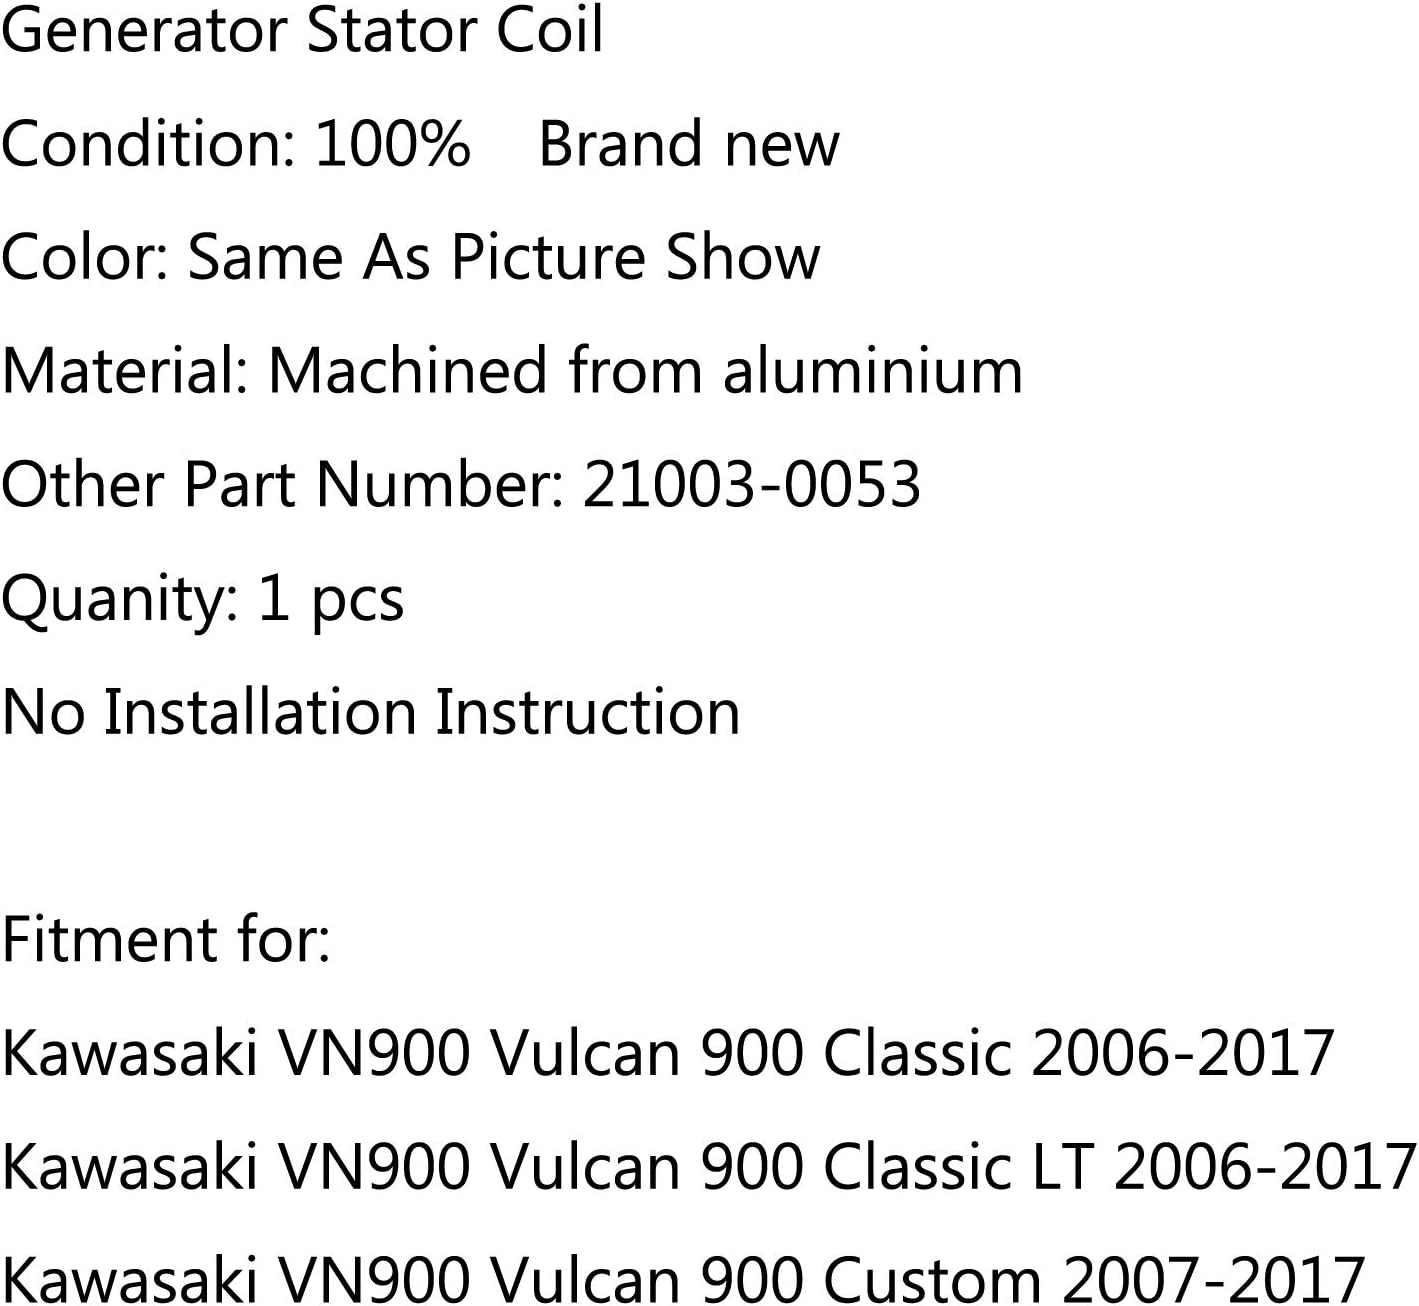 Generator Stator Coil For Kawasaki VN900 Vulcan 900 Classic 06-17 Custom 2007-17 Bruce /& Shark